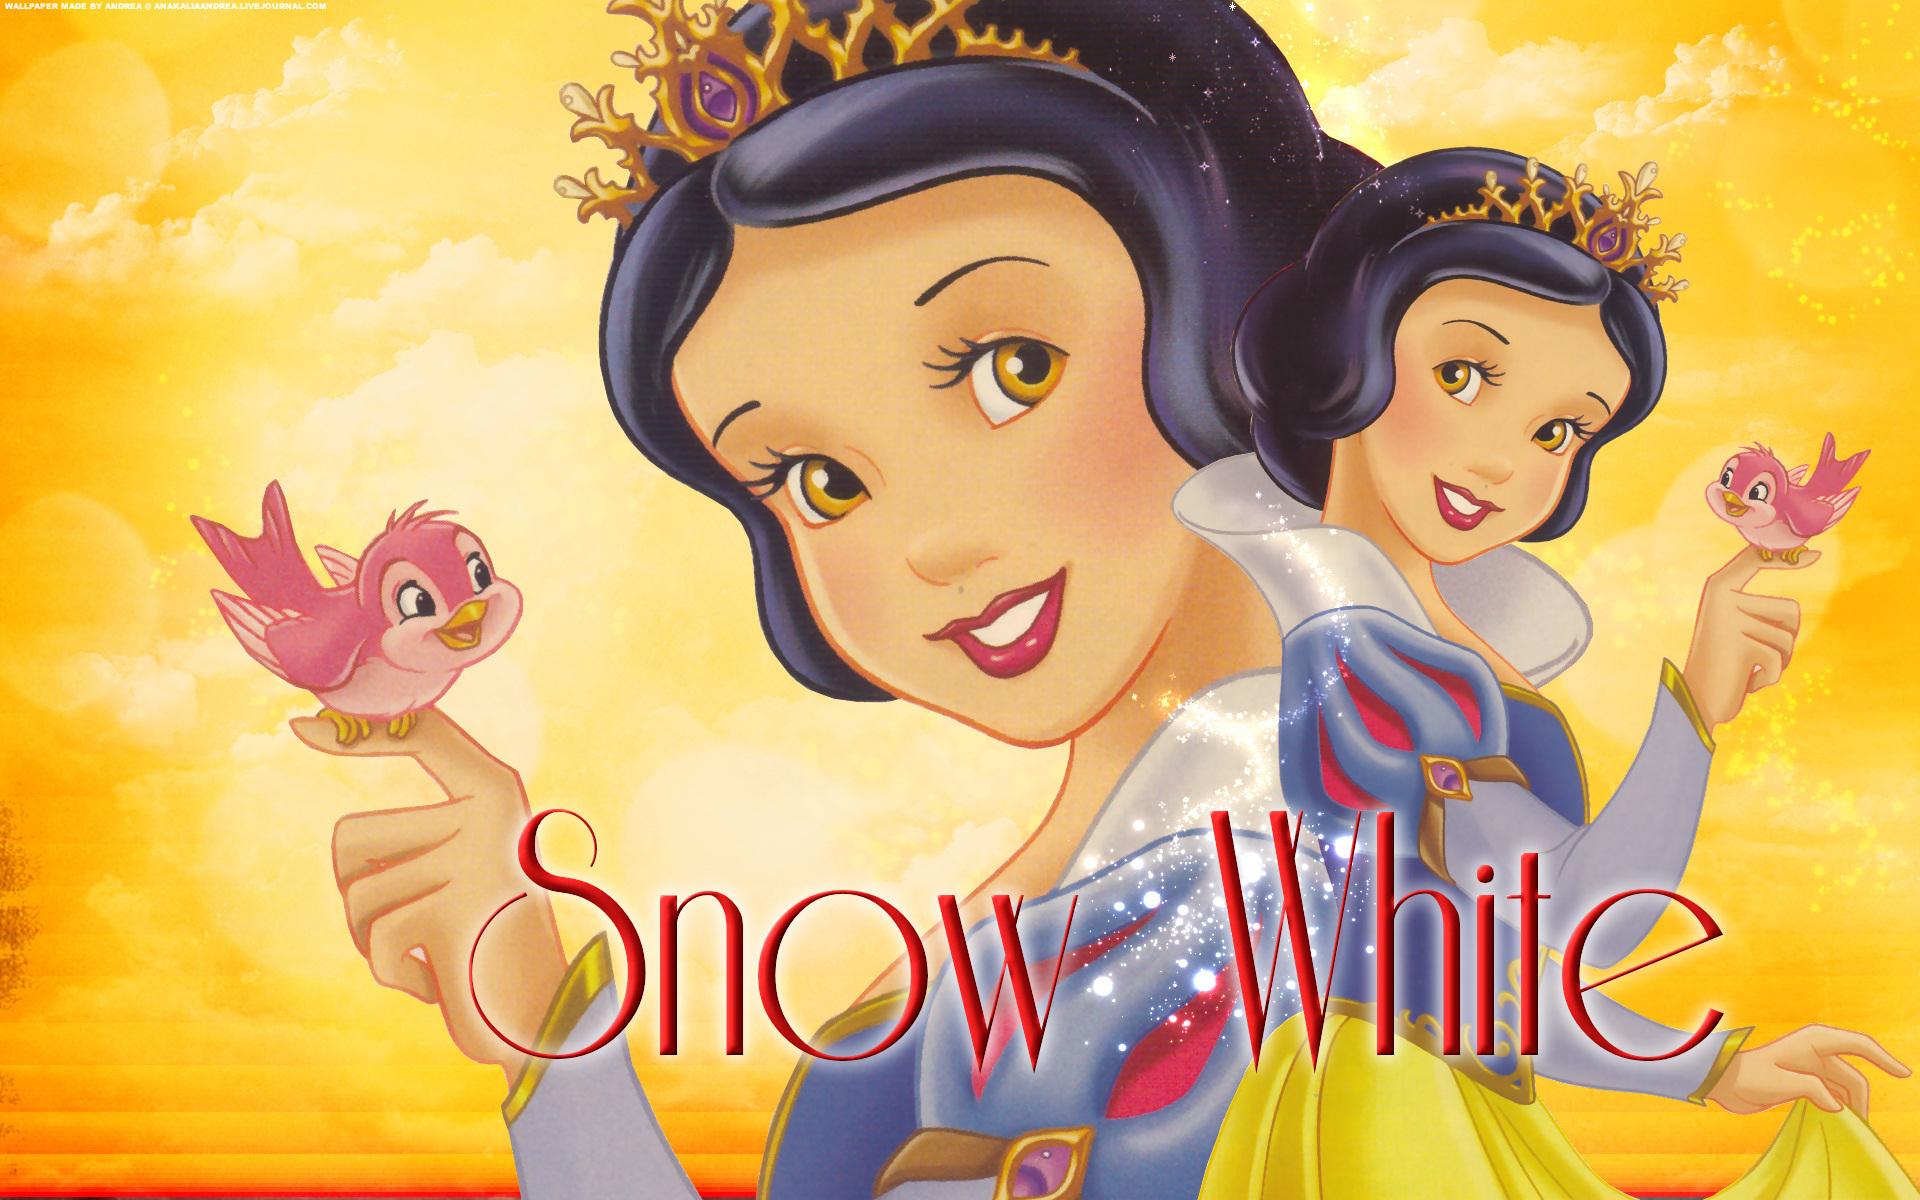 أميرات ديزنى رائعة Snow-White-classic-disney-4918196-1920-1200